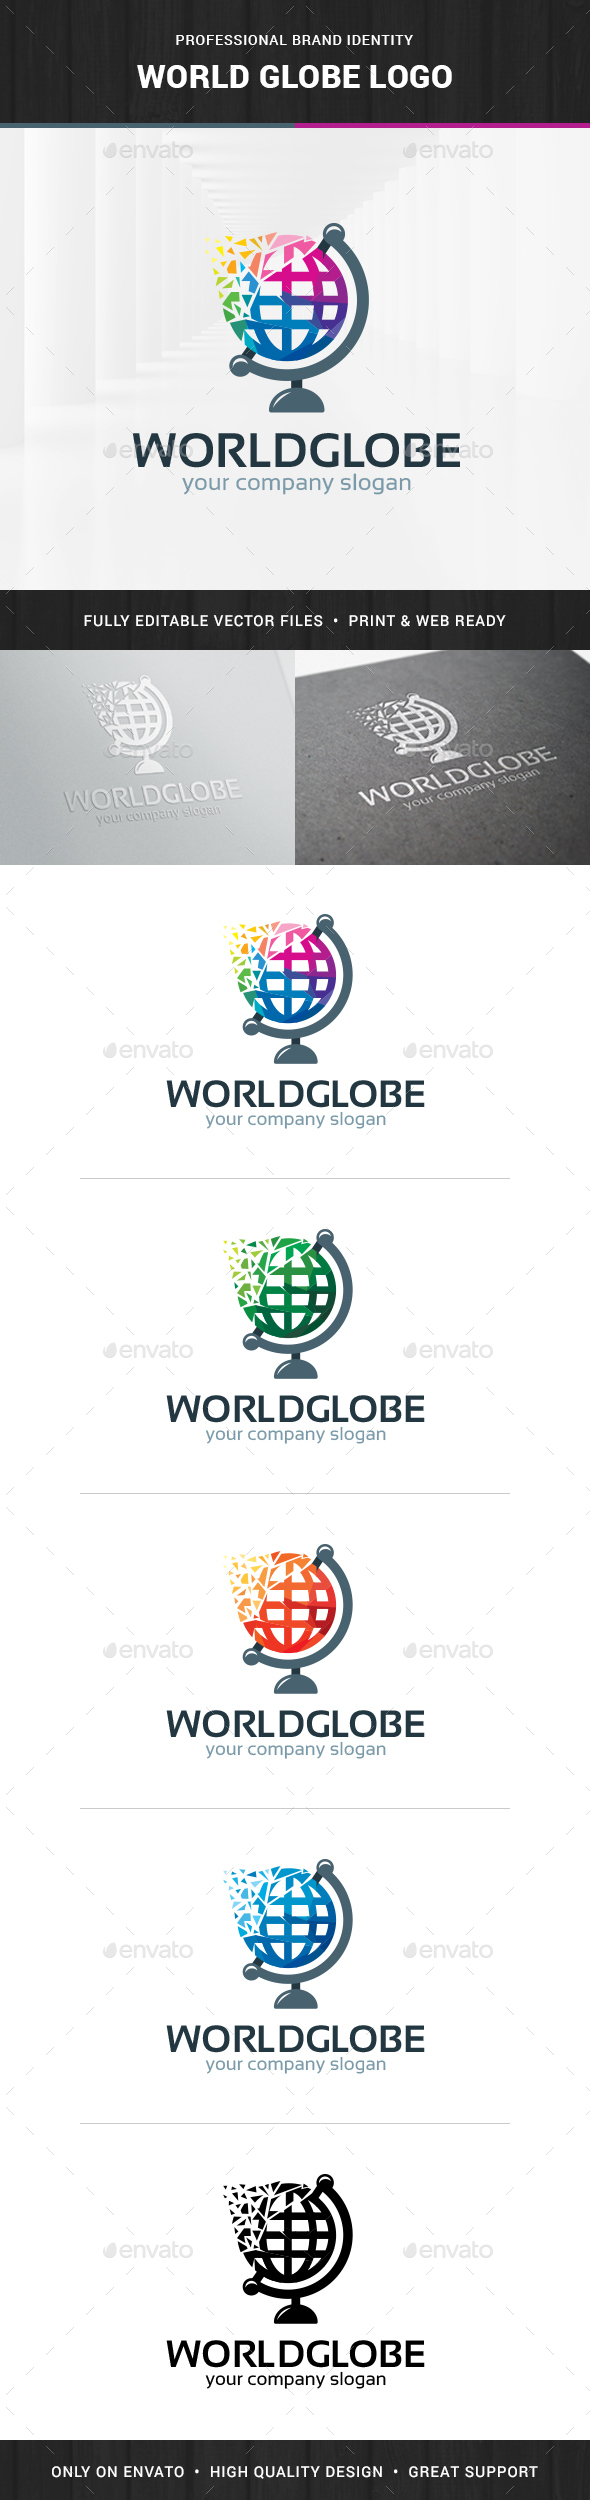 World Globe Logo Template - Objects Logo Templates